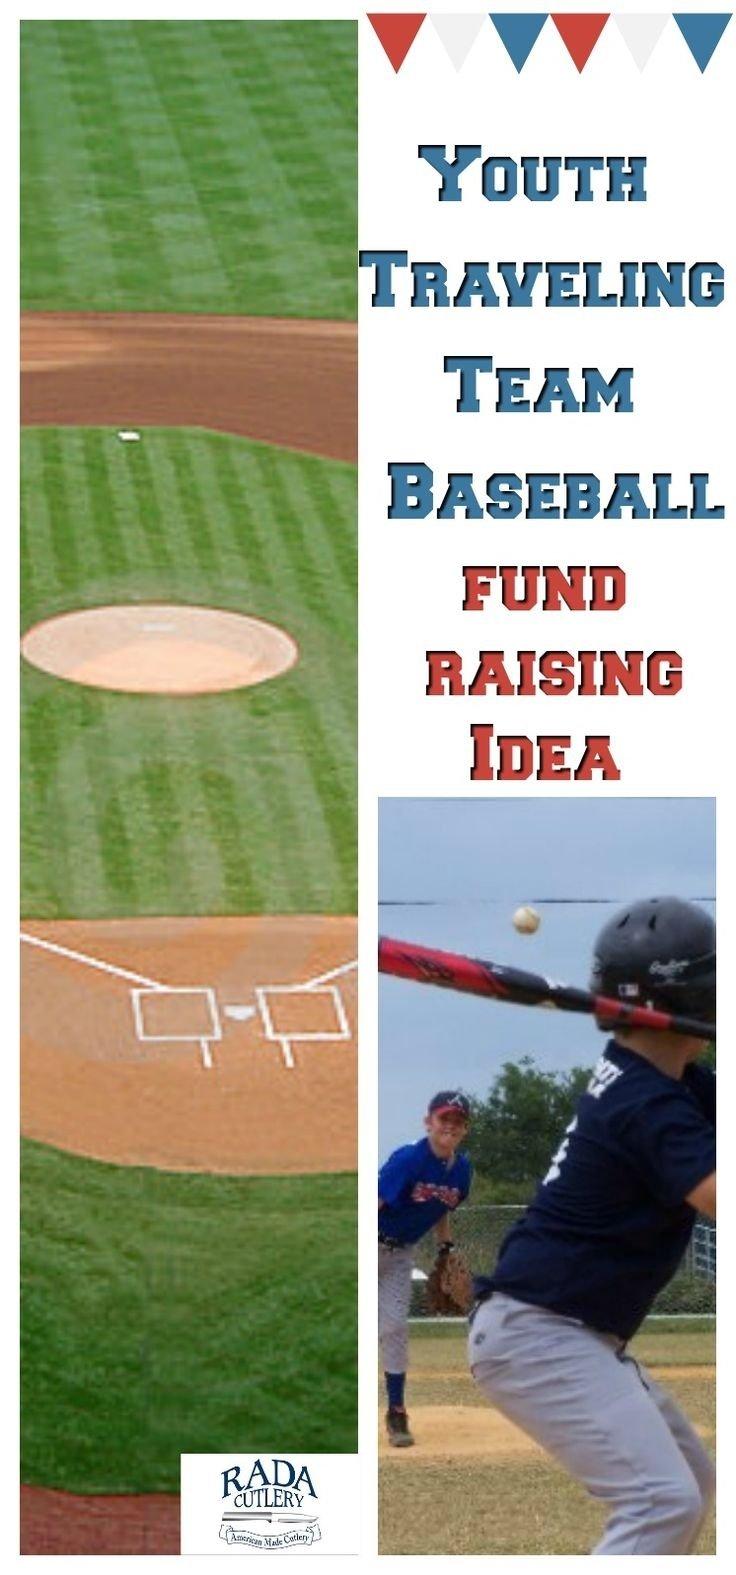 10 Cute Fundraising Ideas For Baseball Teams 125 best fundraising images on pinterest fundraisers fundraising 2020